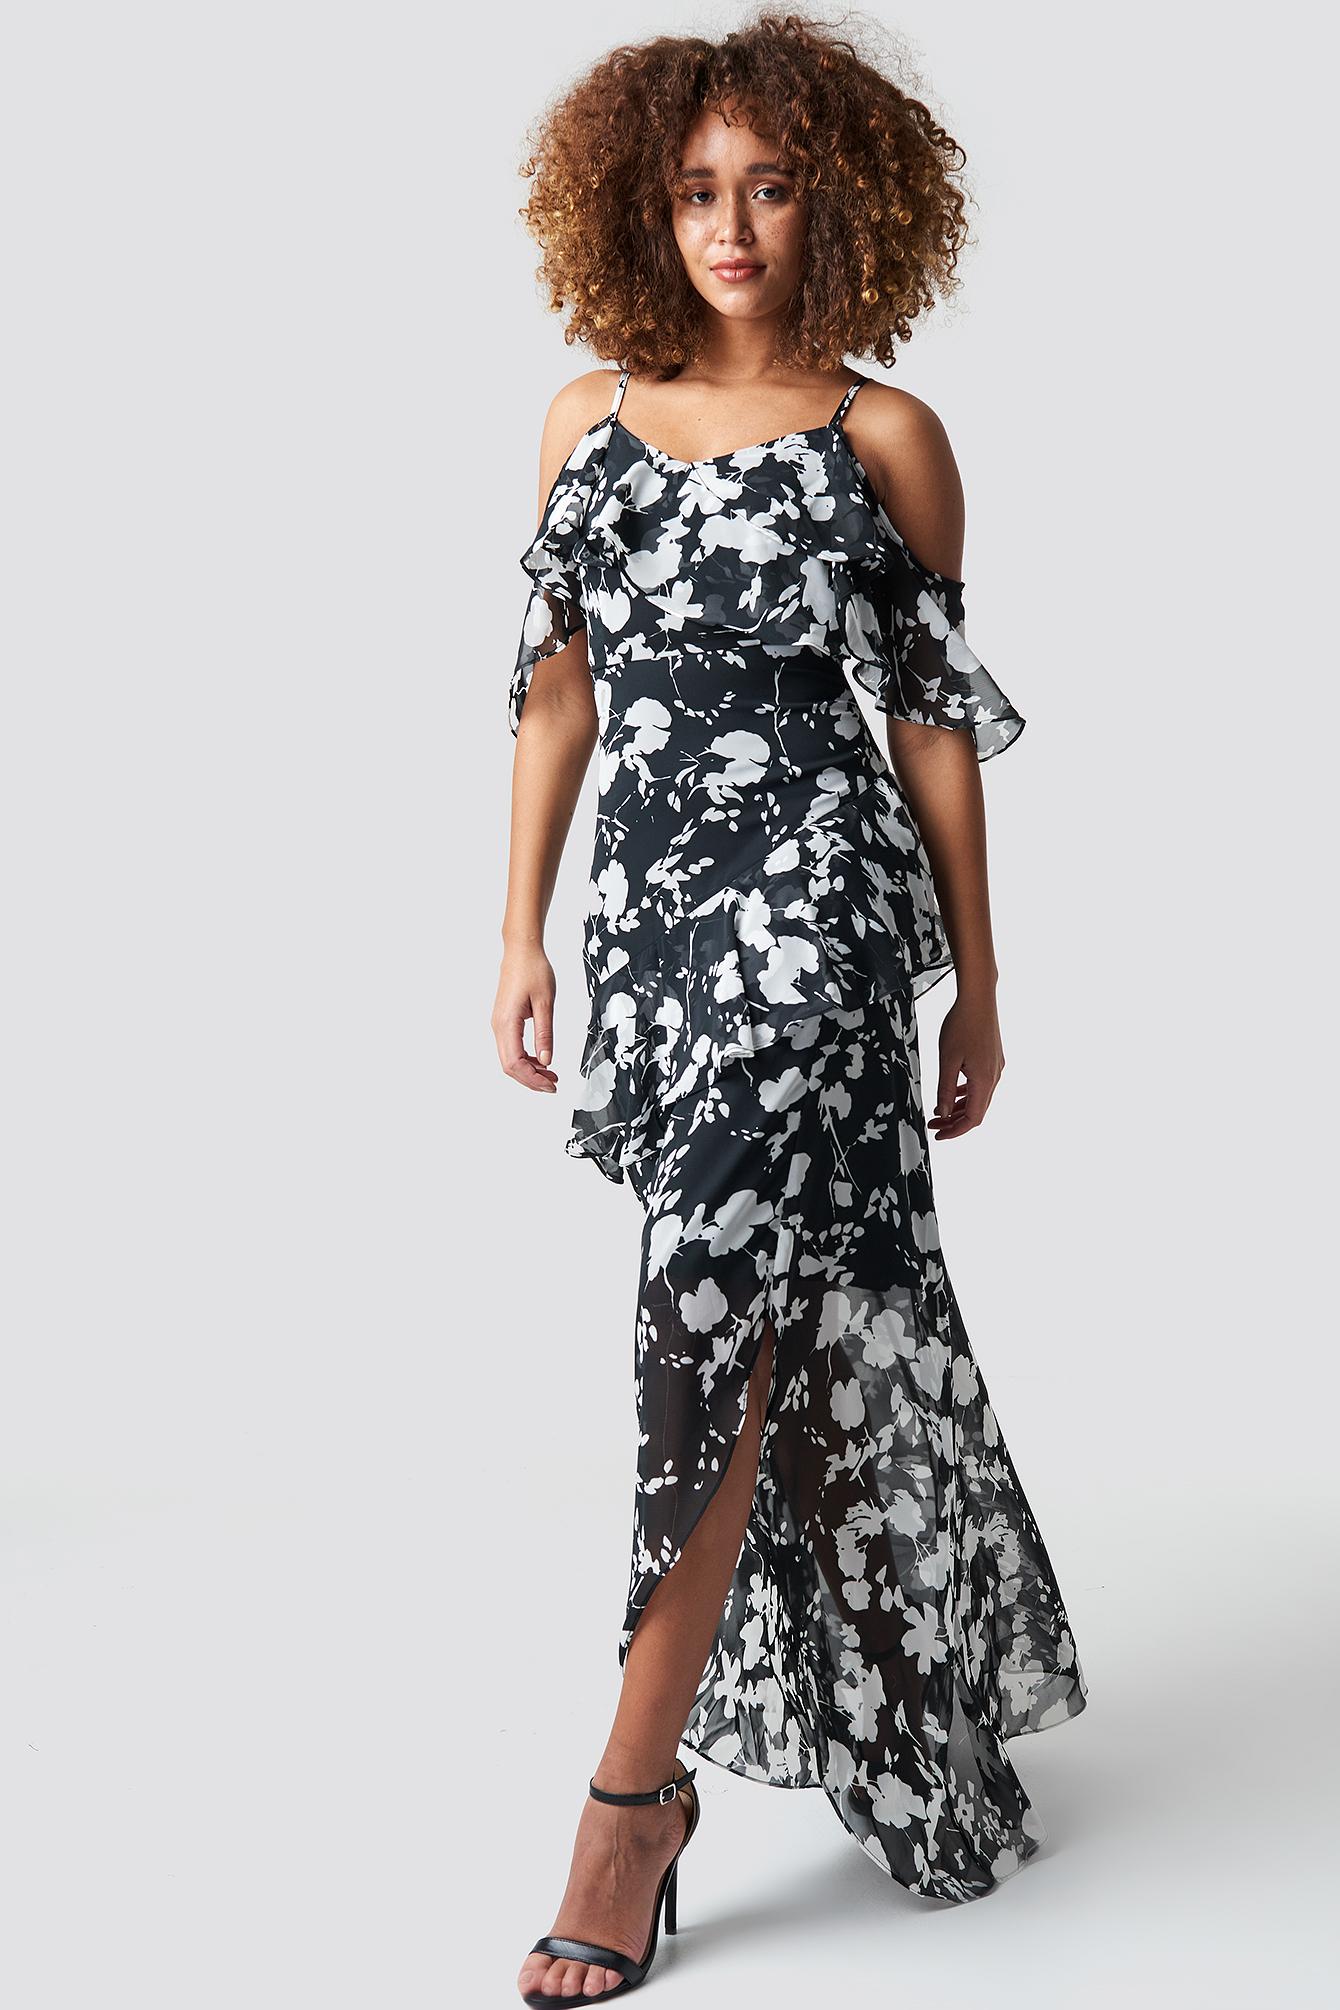 Exclusive Cocktail Dresses